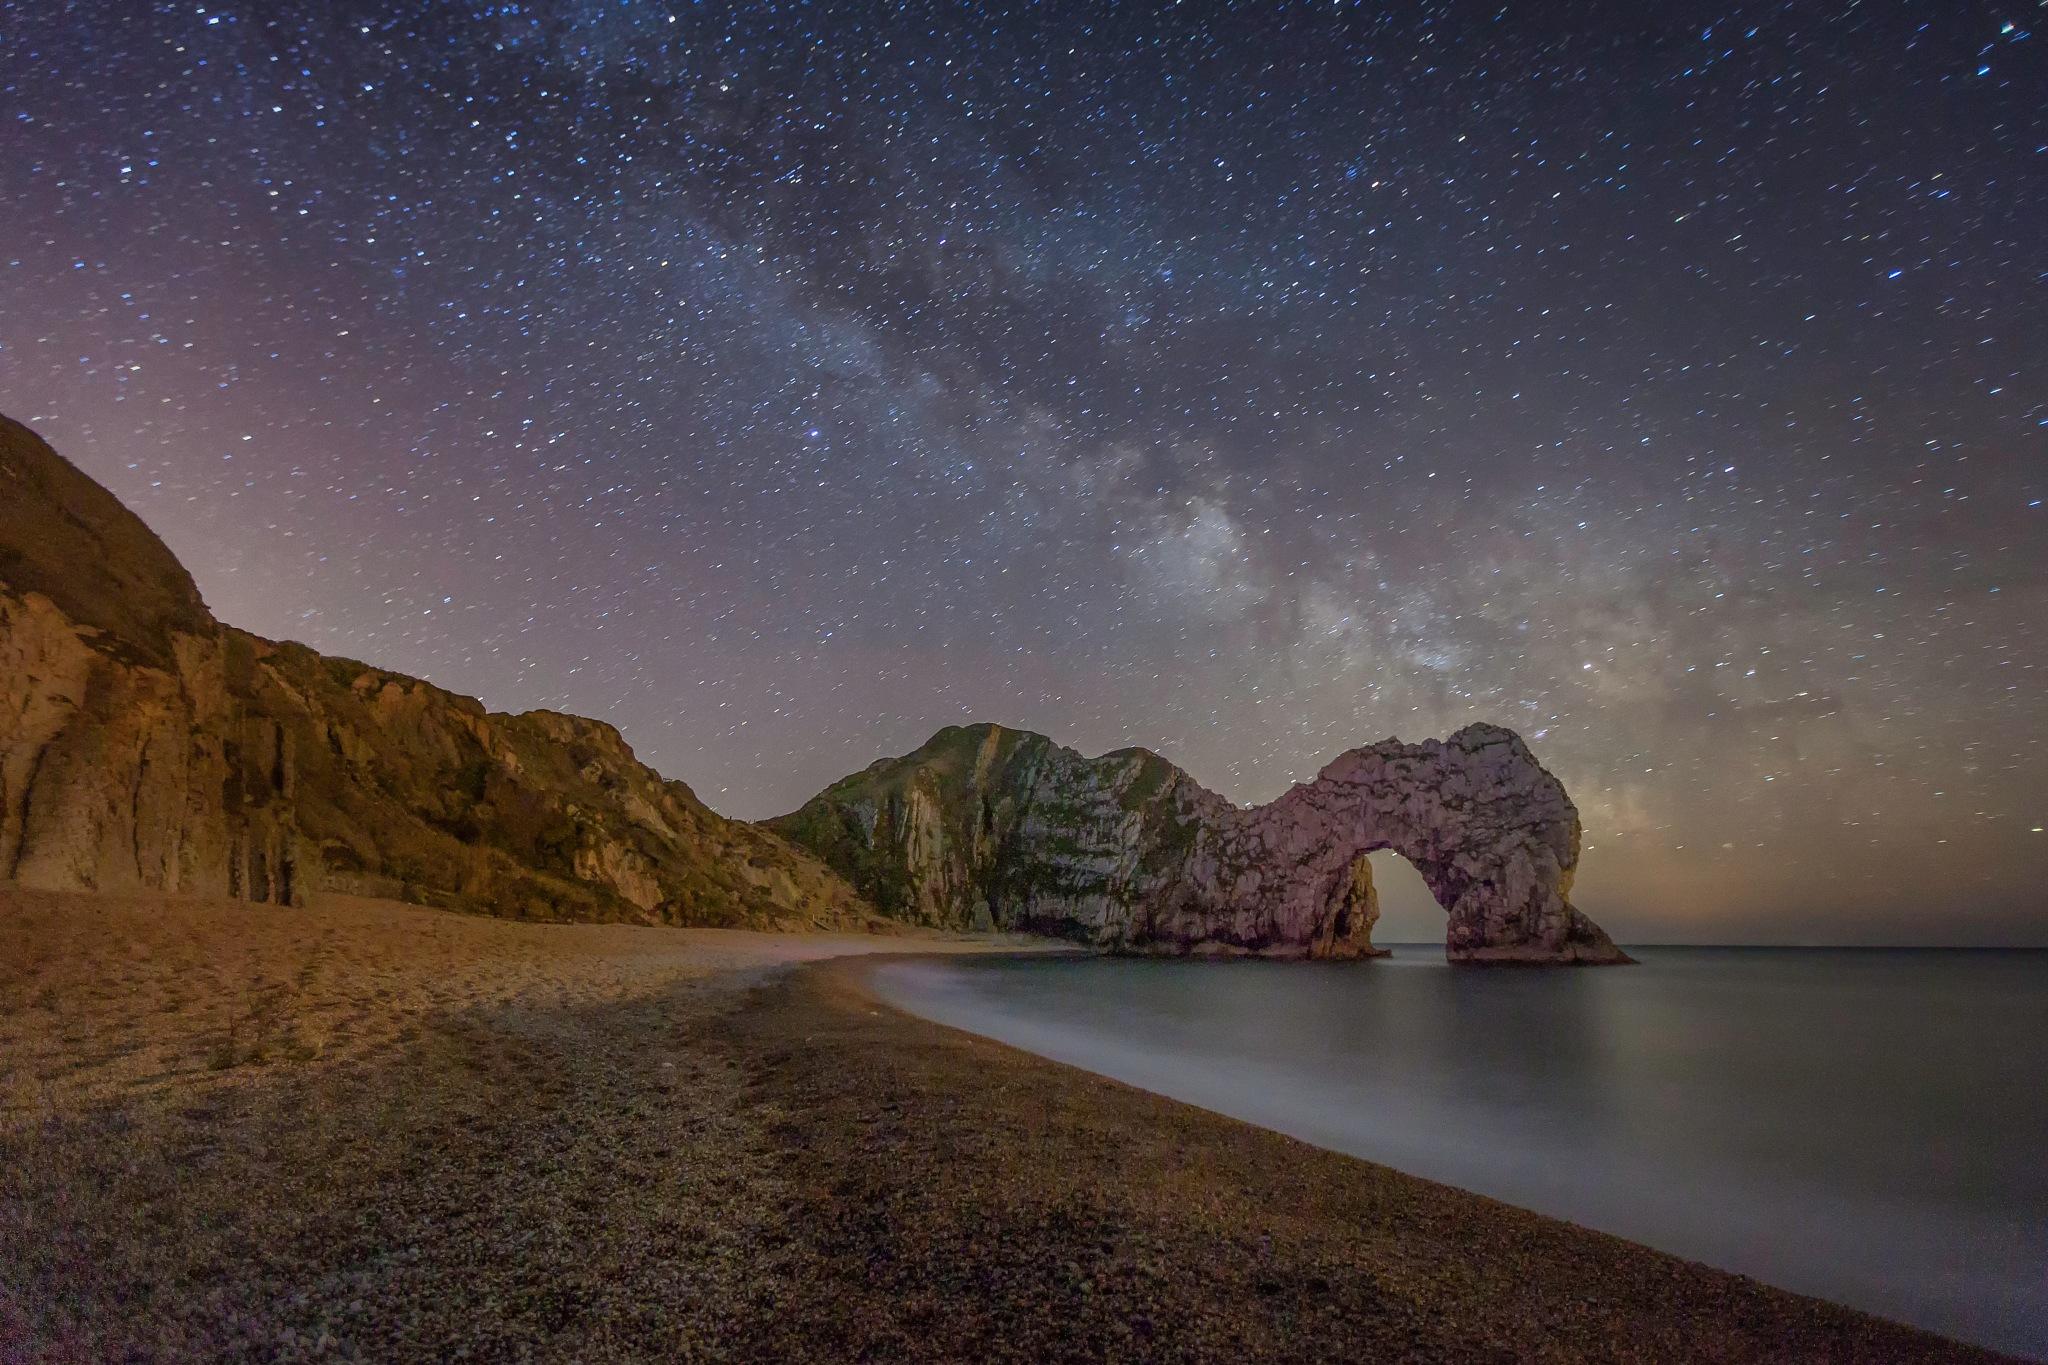 Durdle Door under the Milky Way  by Chris Deane